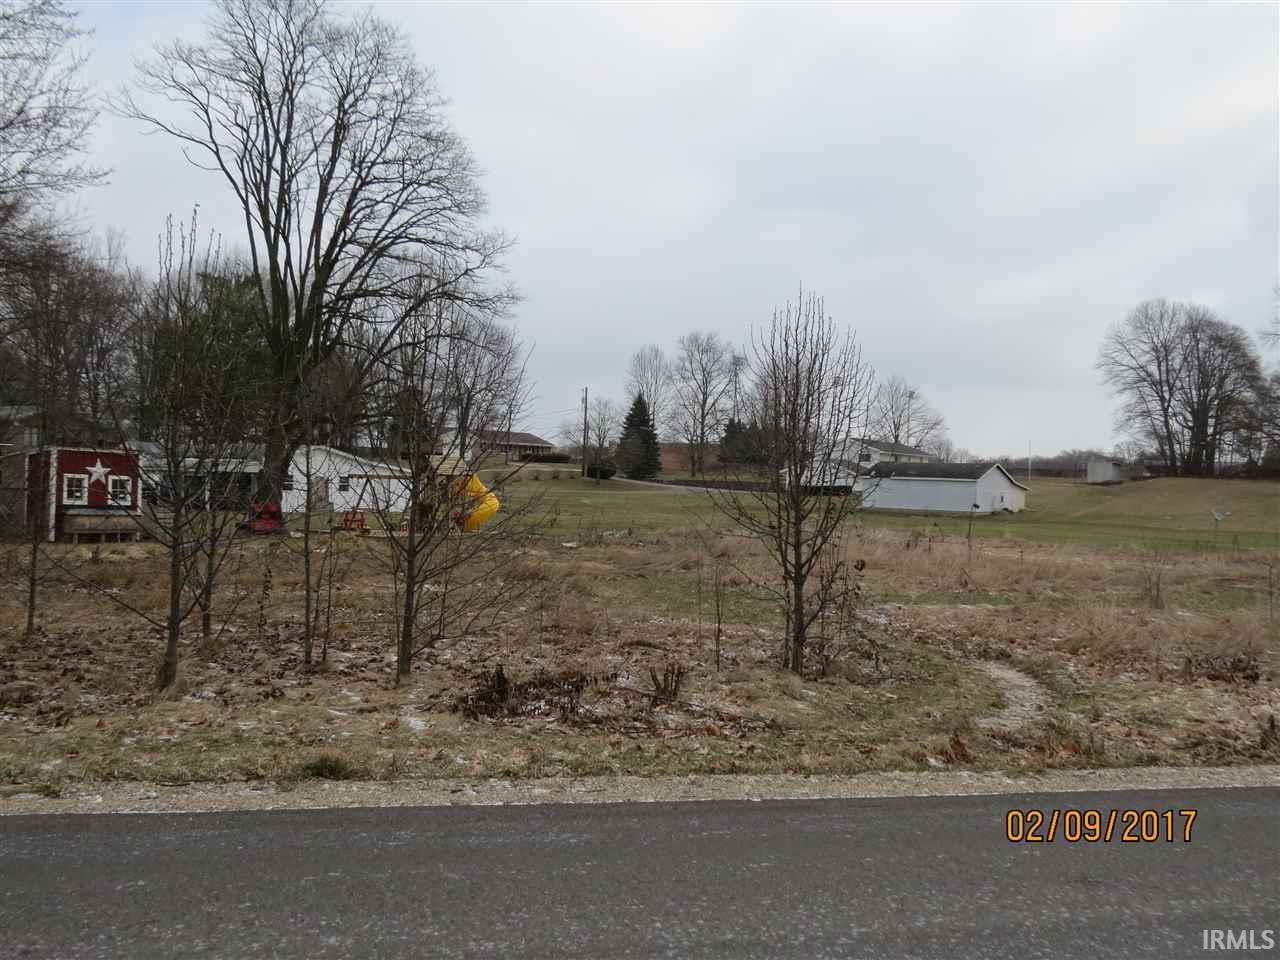 VL County Road 22, Elkhart, IN 46517